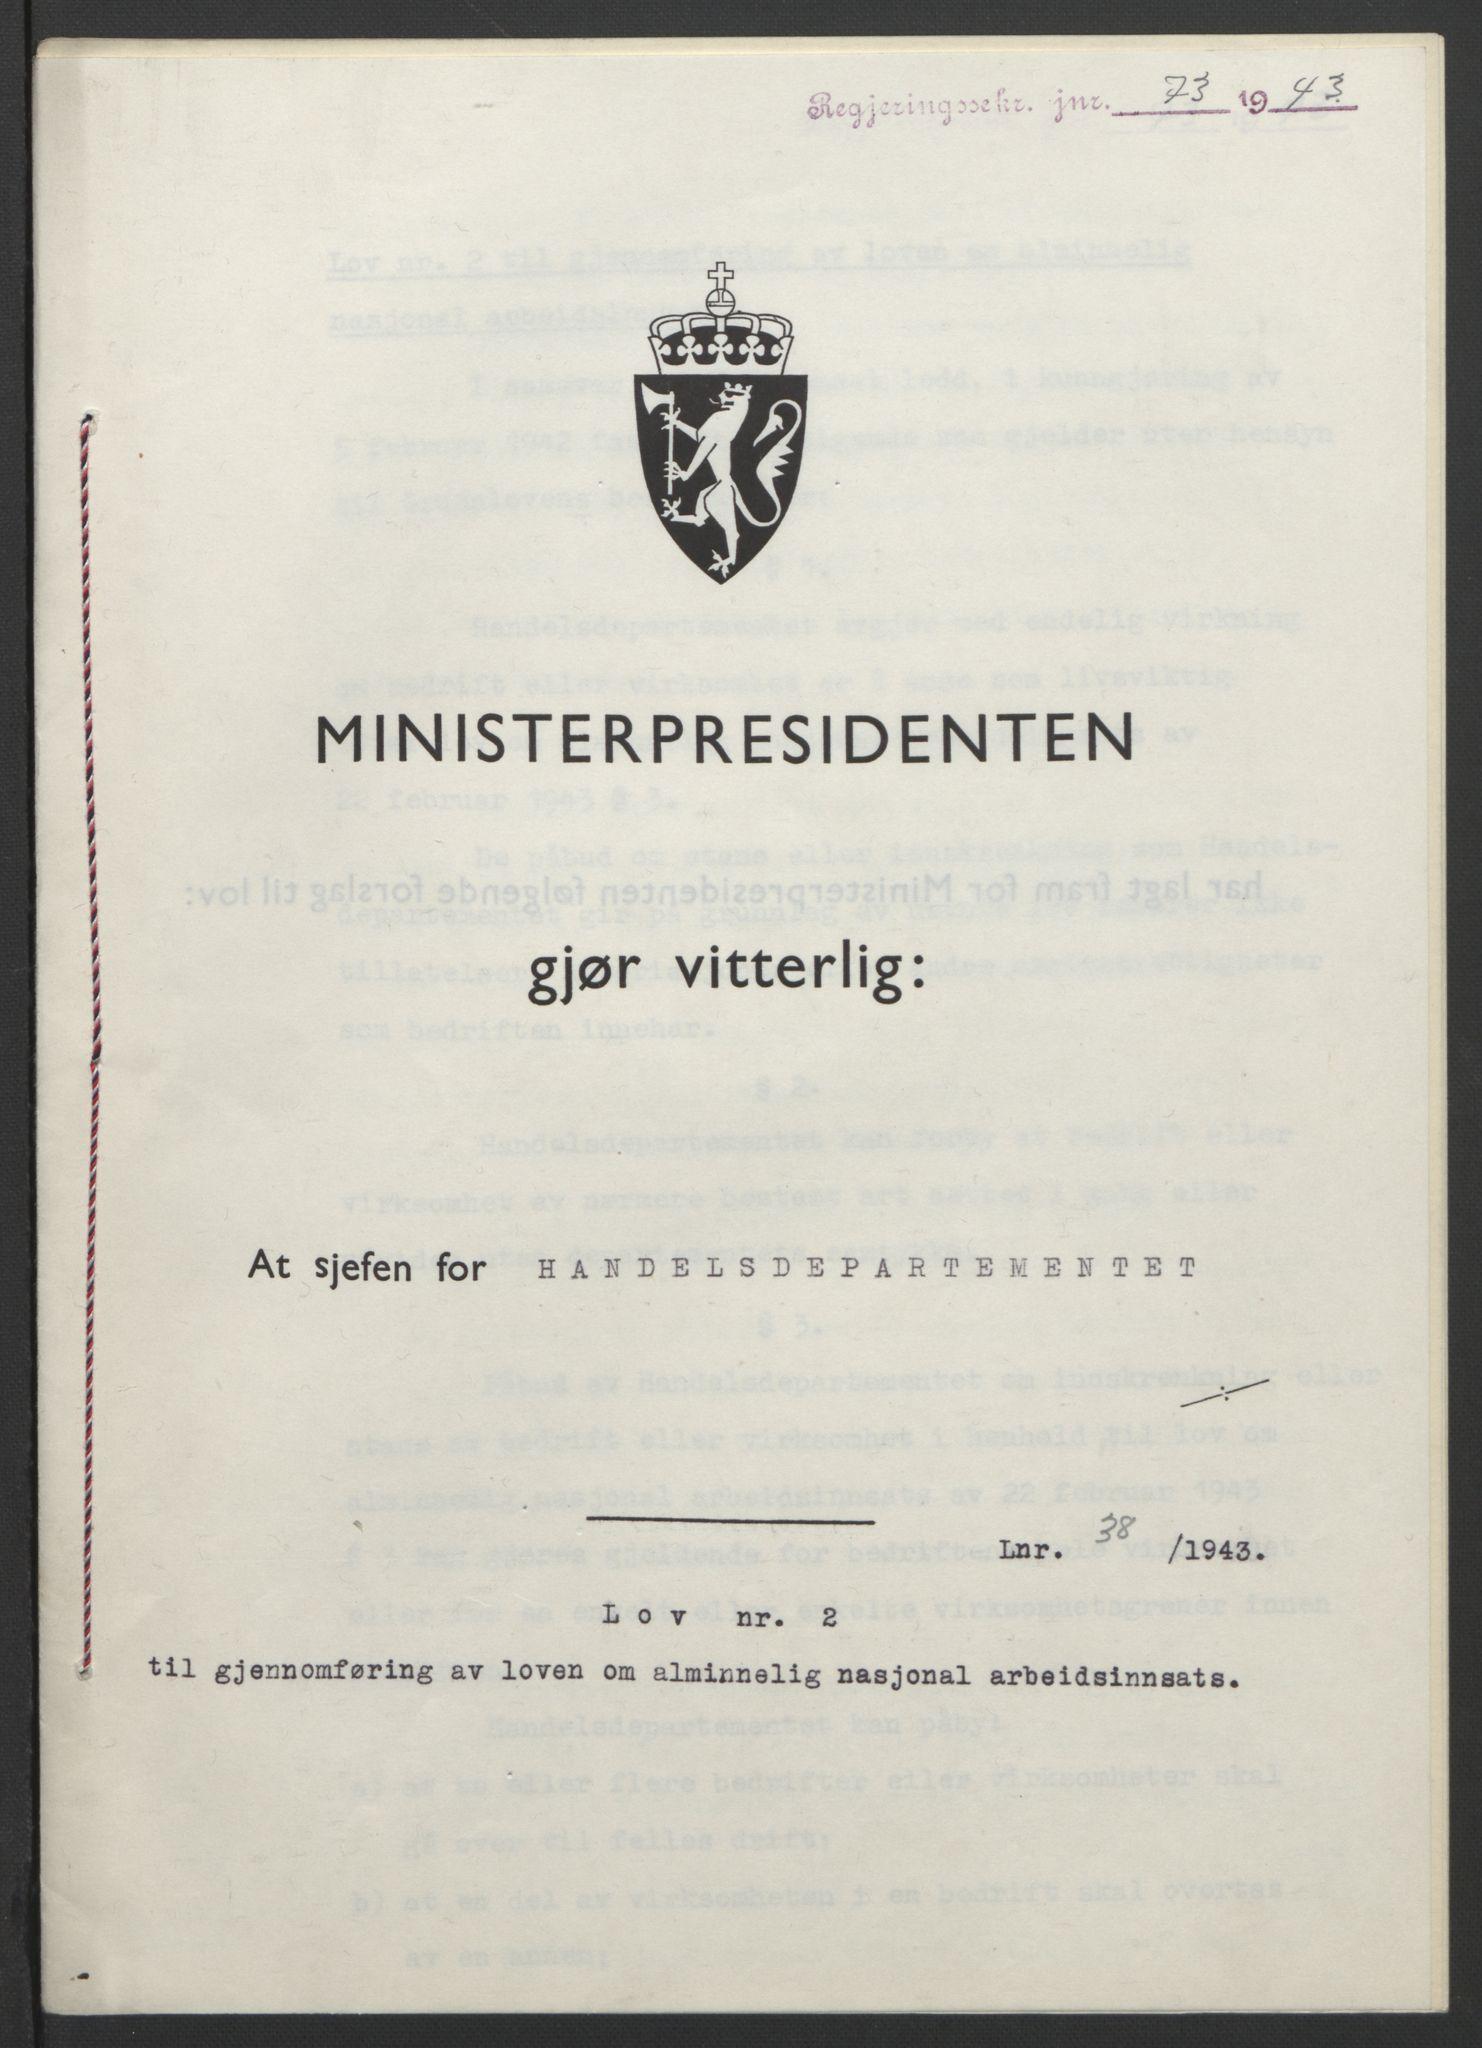 RA, NS-administrasjonen 1940-1945 (Statsrådsekretariatet, de kommisariske statsråder mm), D/Db/L0099: Lover, 1943, s. 162